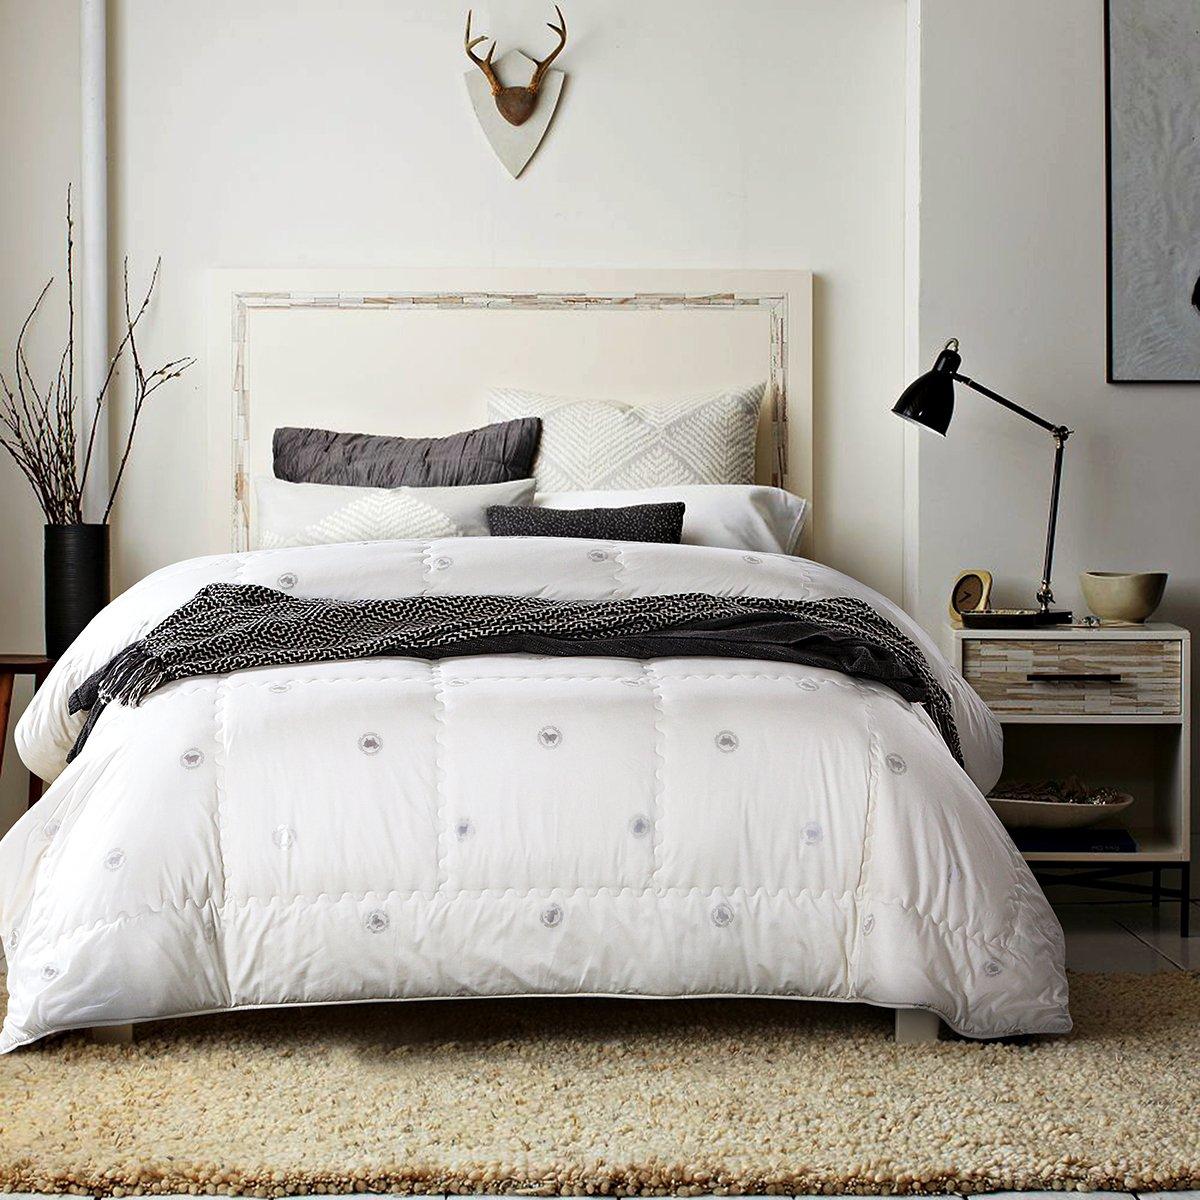 100% Natural Australian Wool Duvet Insert/Comforter